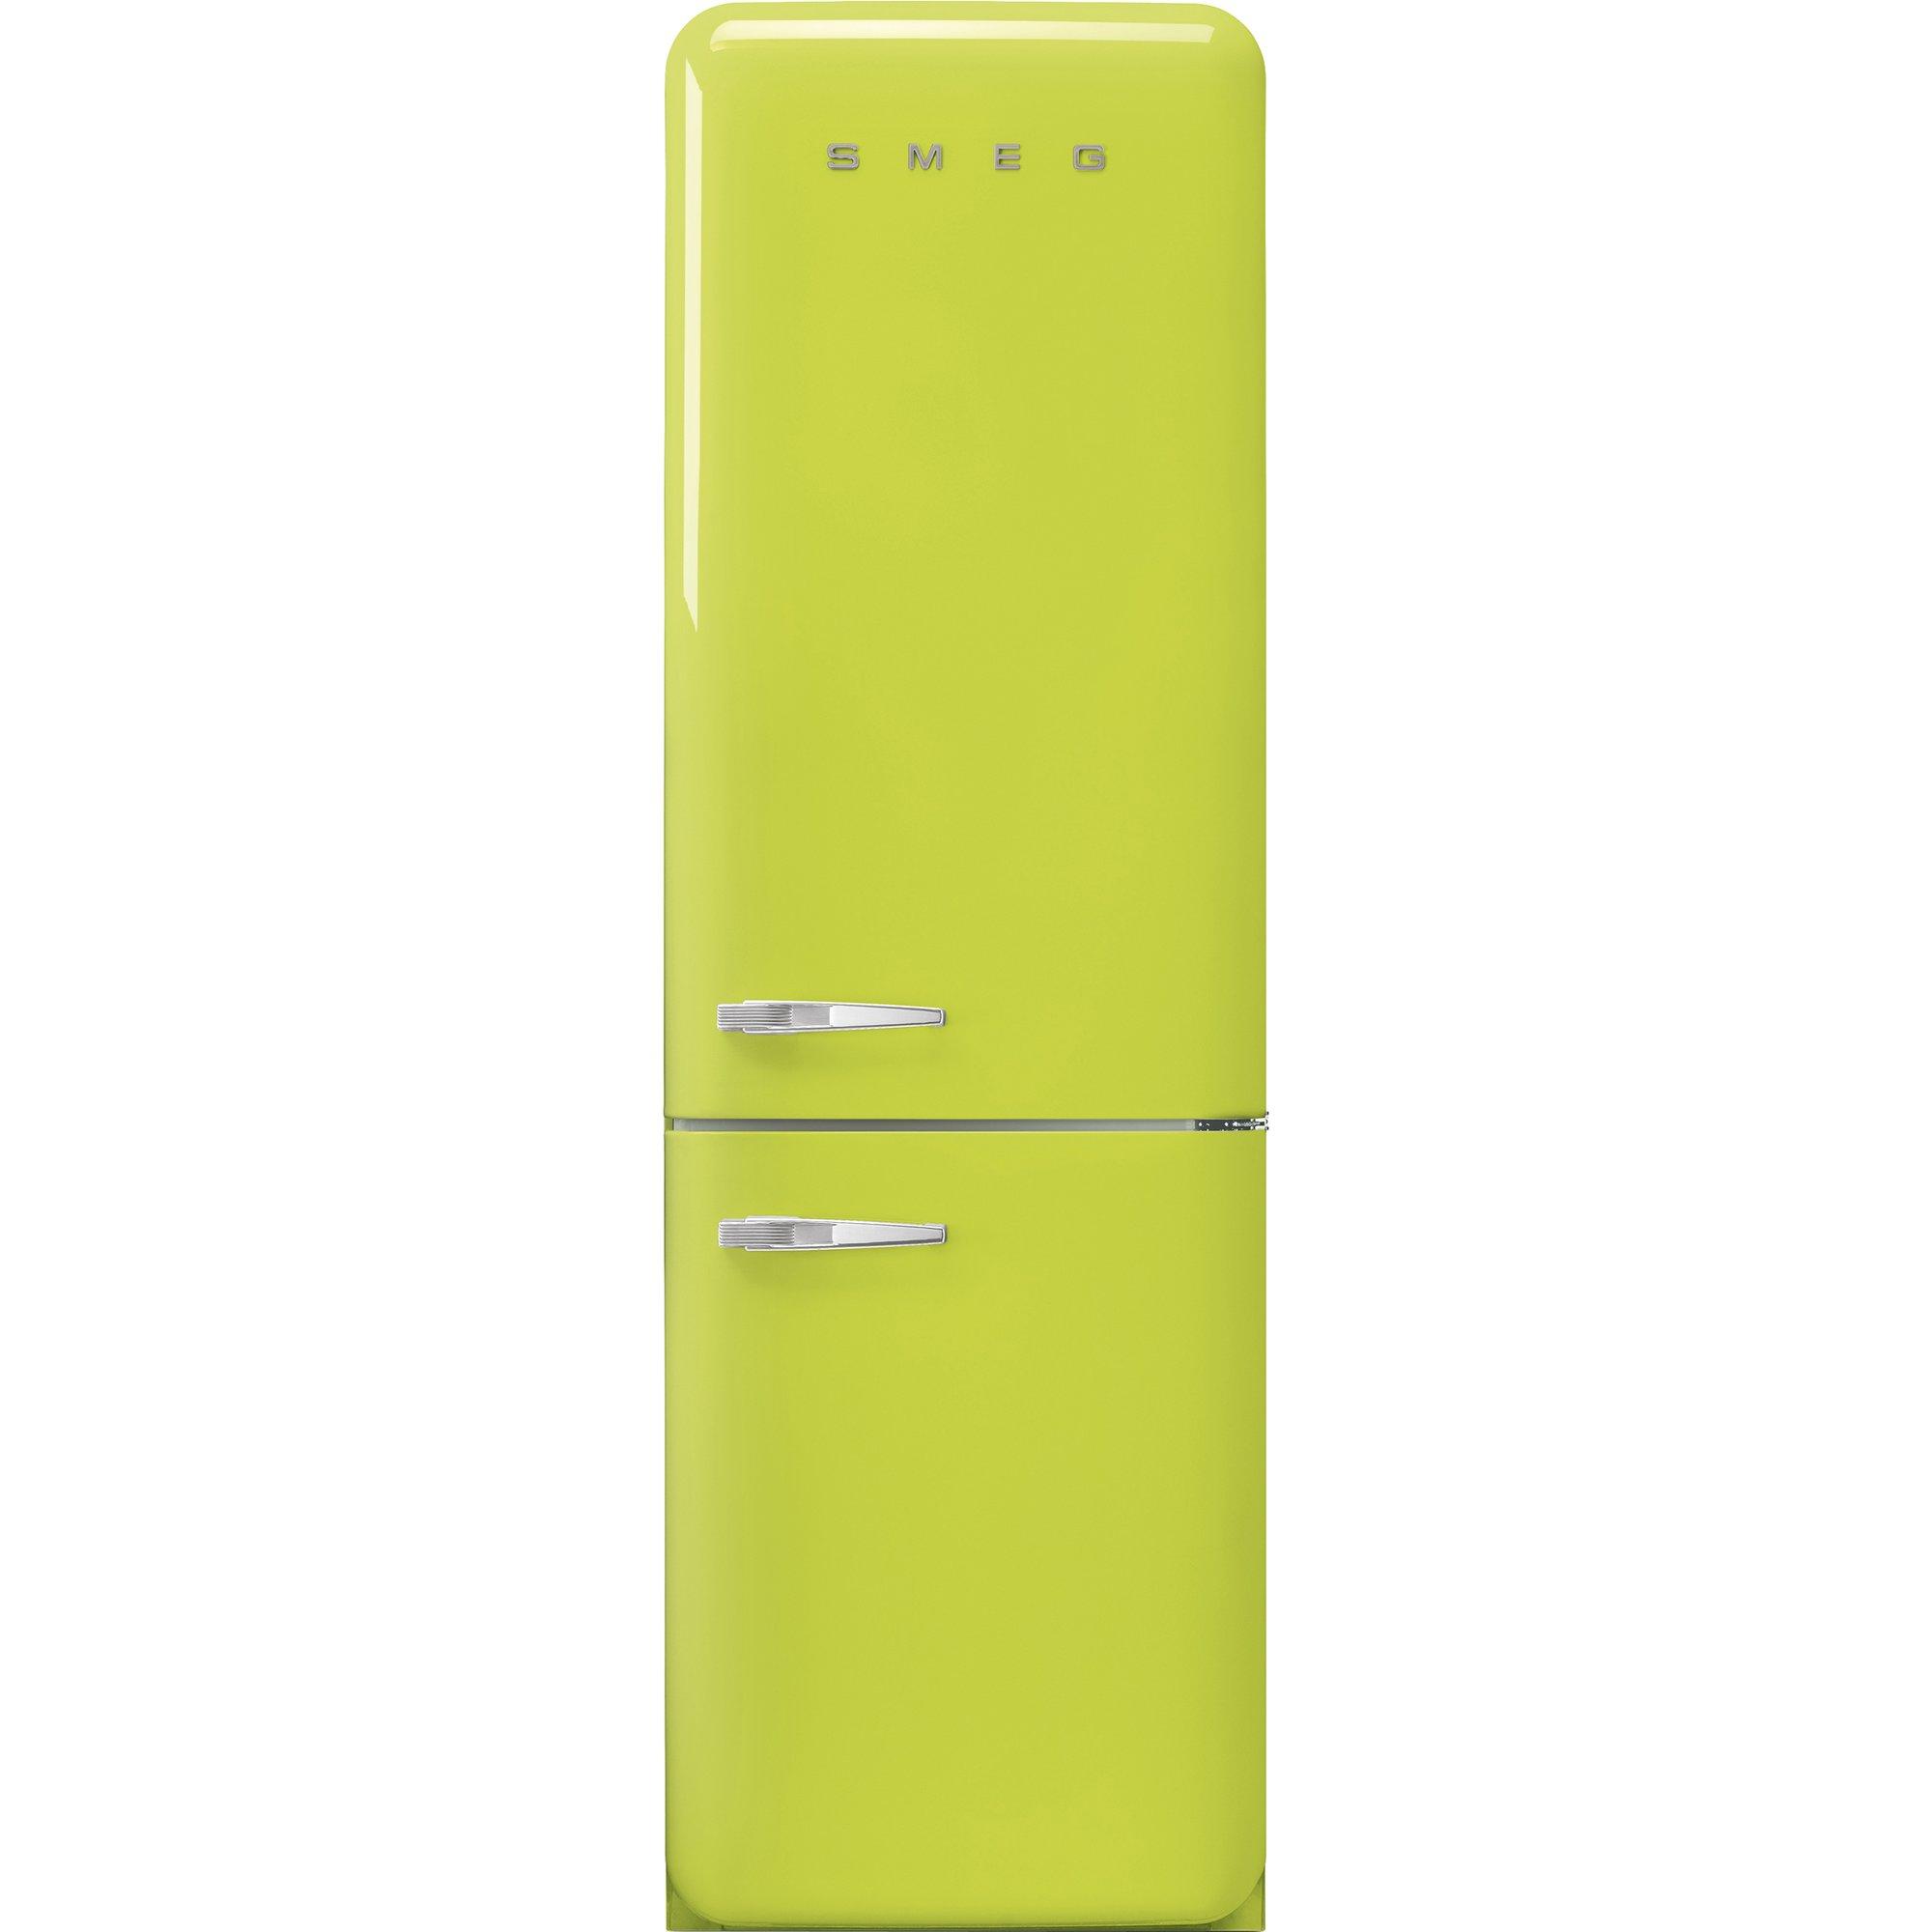 Smeg Kylskåp/frys i 50-tals retrostil högerhängt limegrön